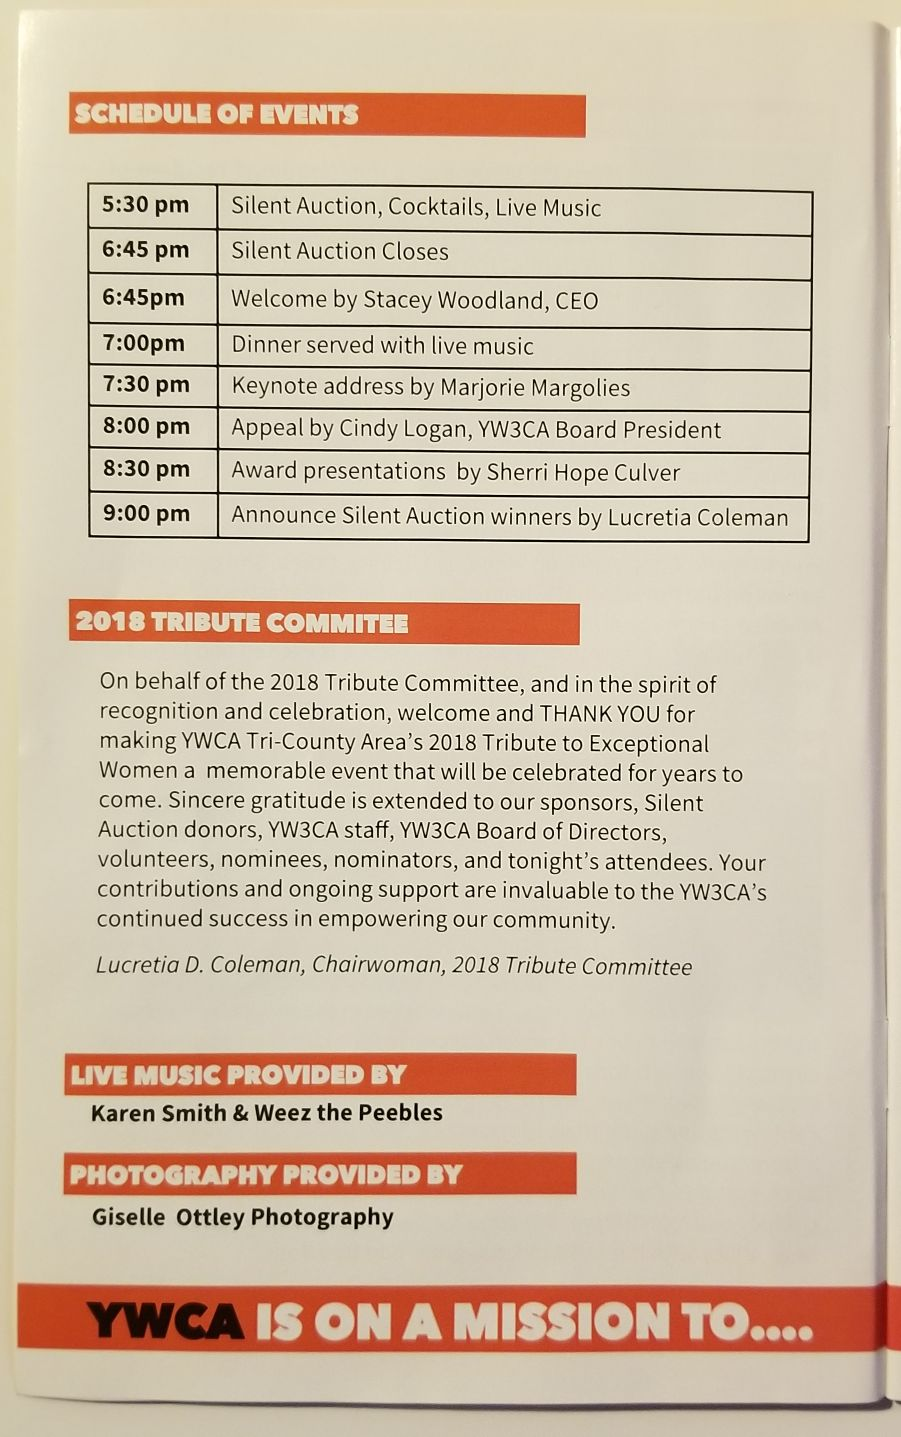 YWCA_programme.jpeg